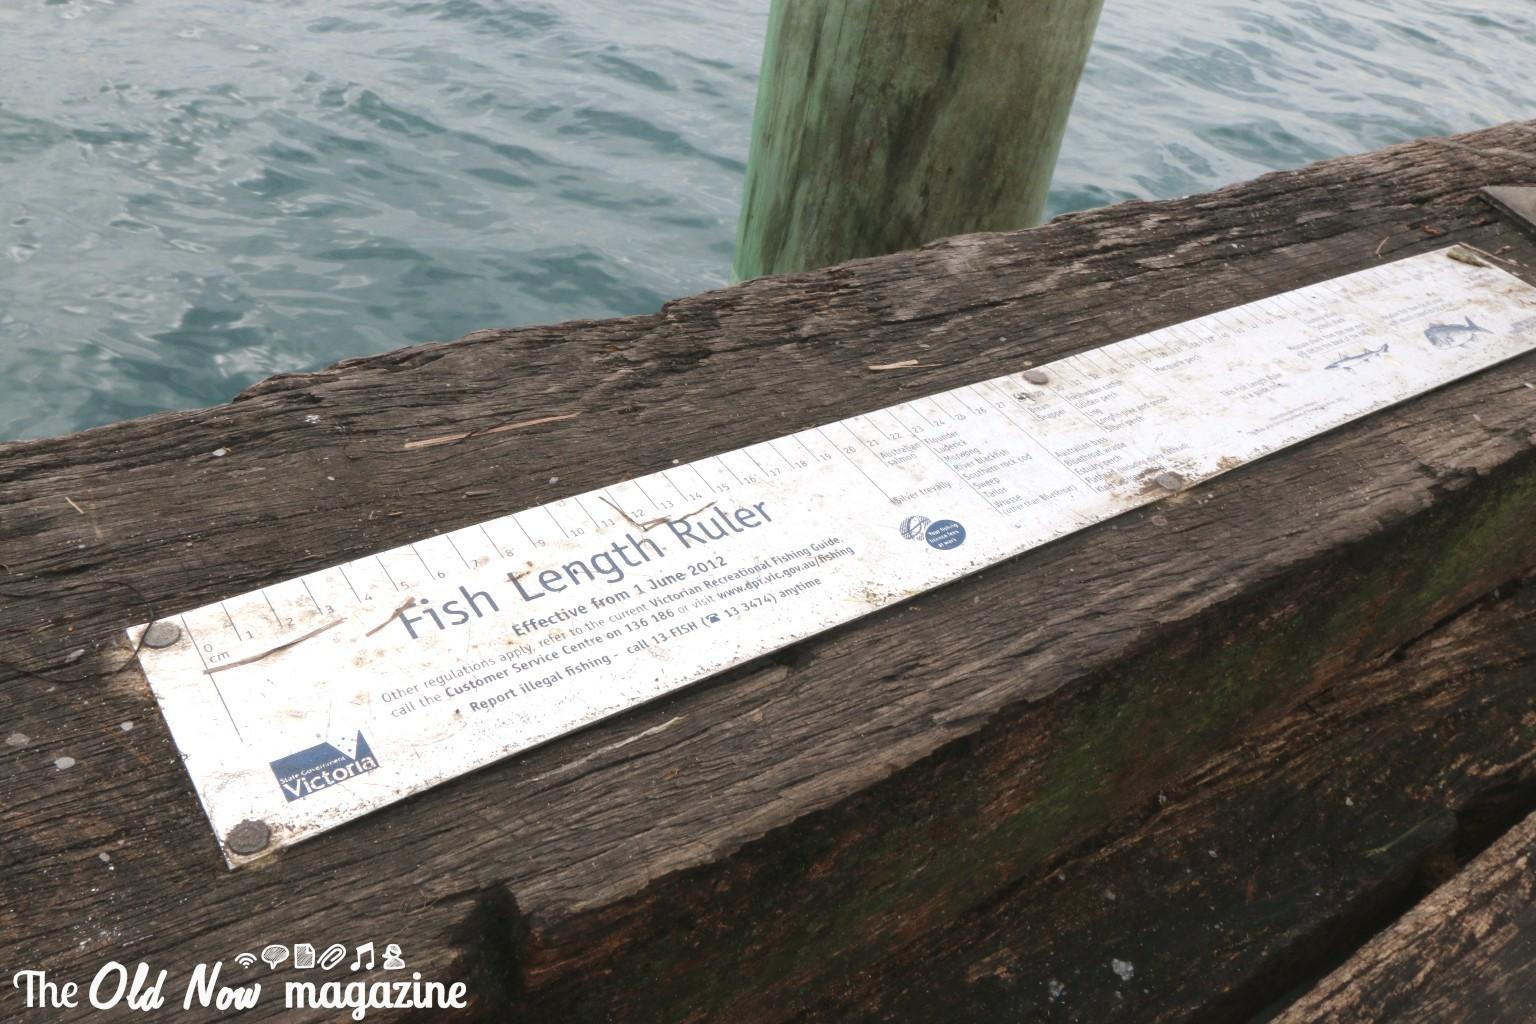 Phillip Island THEOLDNOW (38)